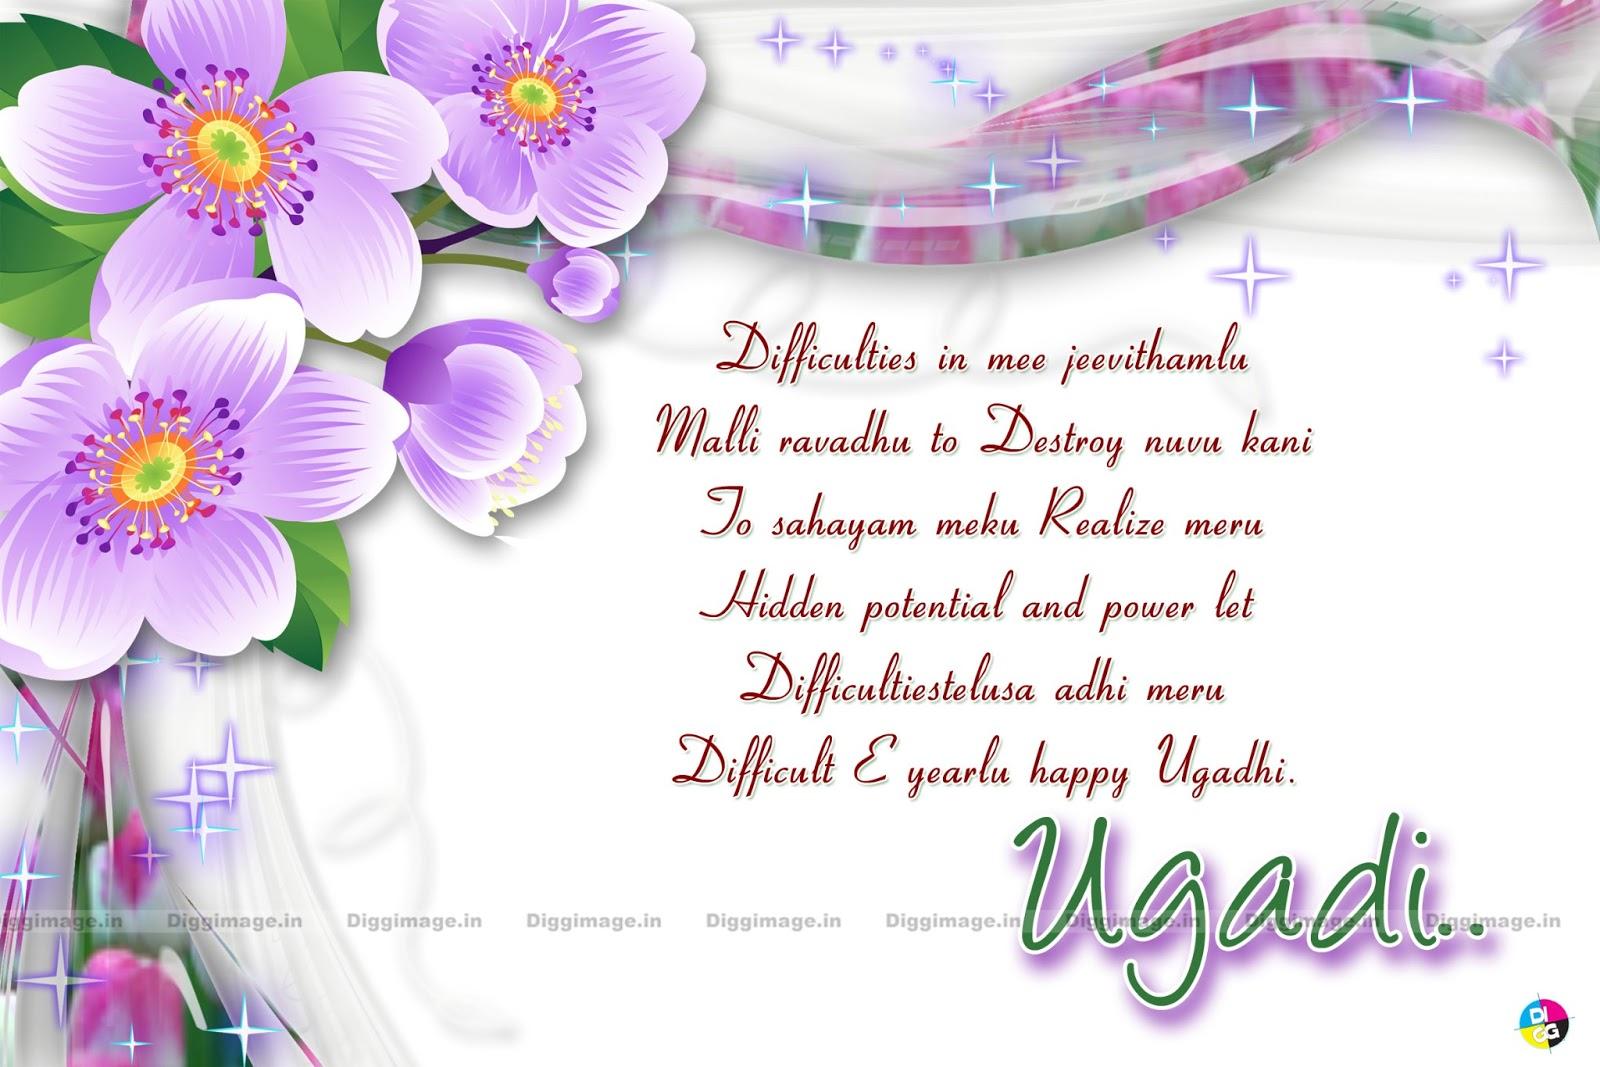 Happy Ugadi Rajesh1128